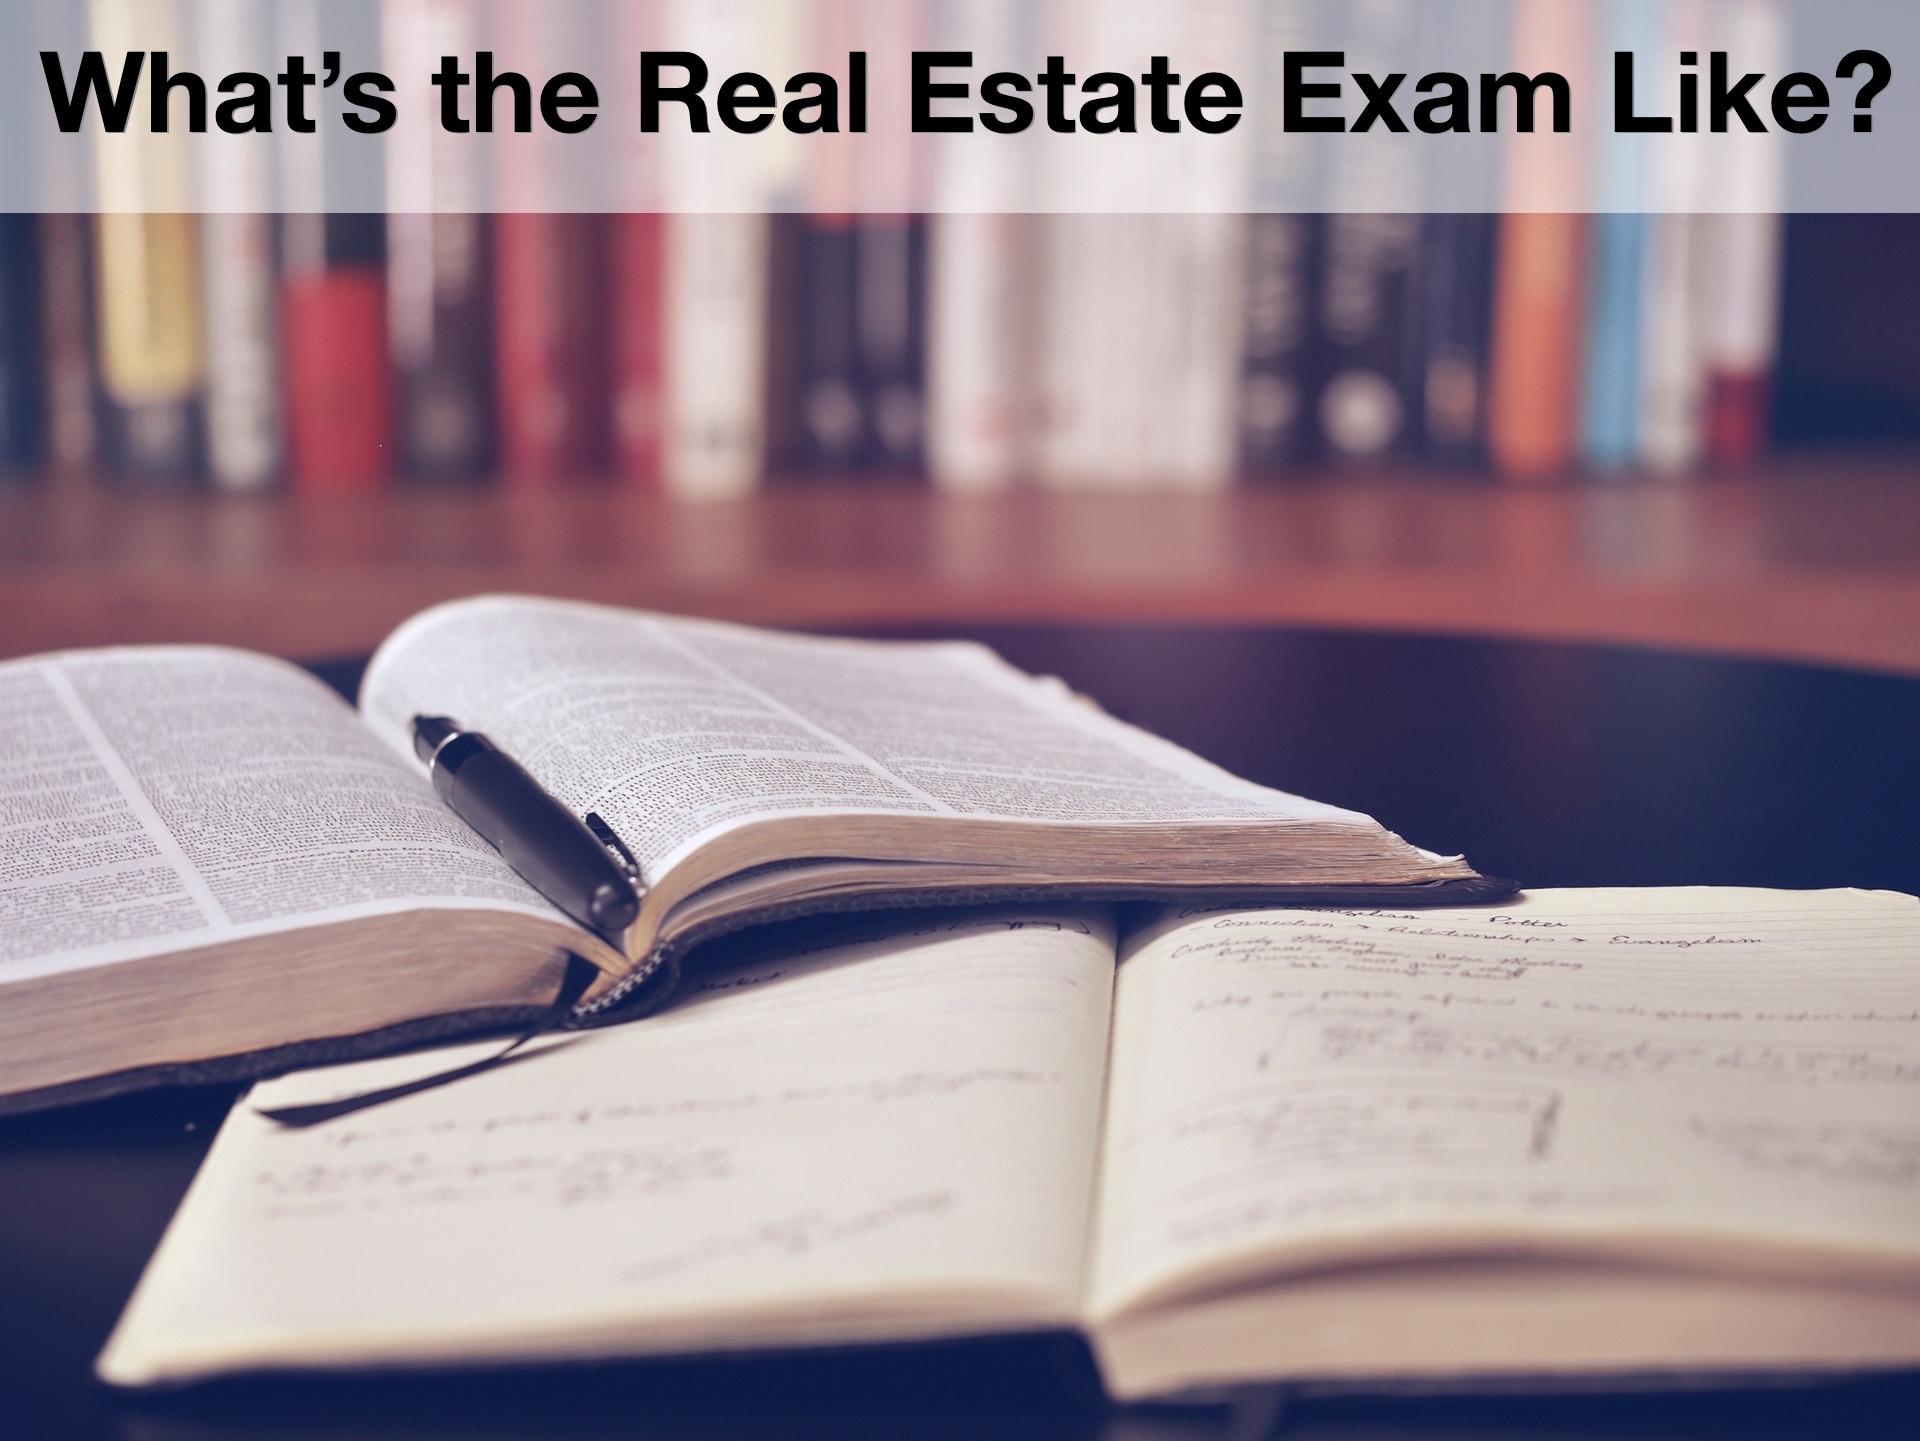 Real estate exam study aid